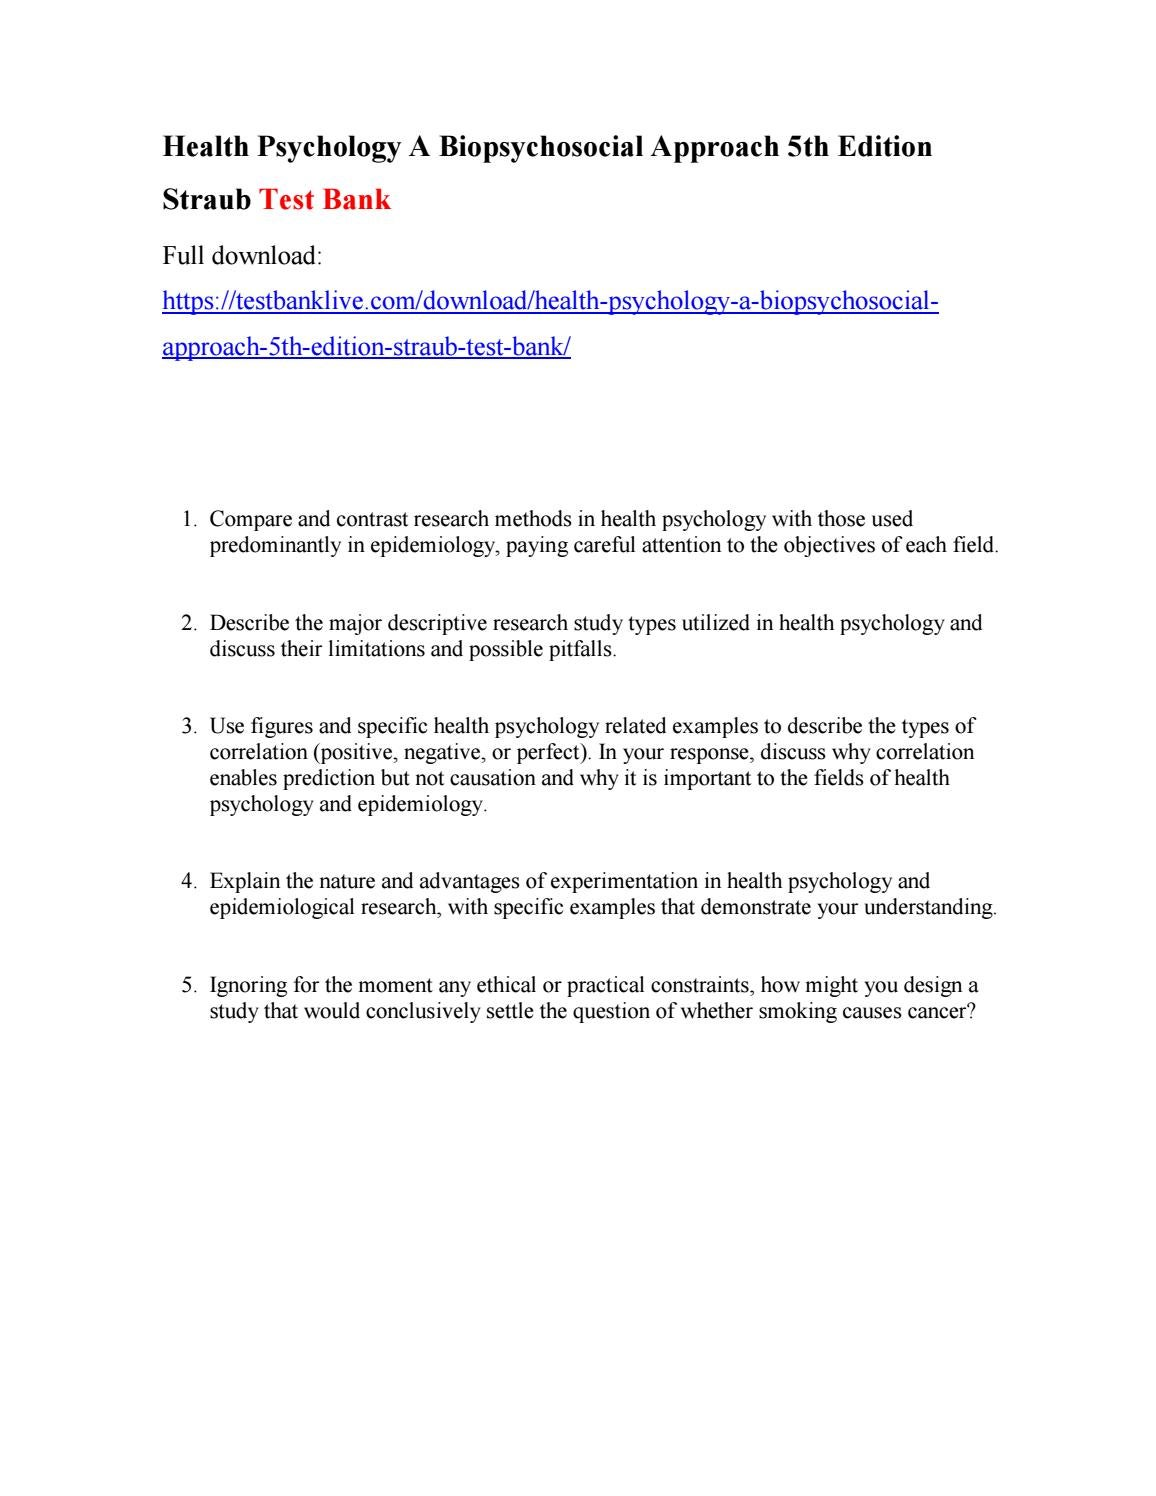 biopsychosocial model of health advantages and disadvantages